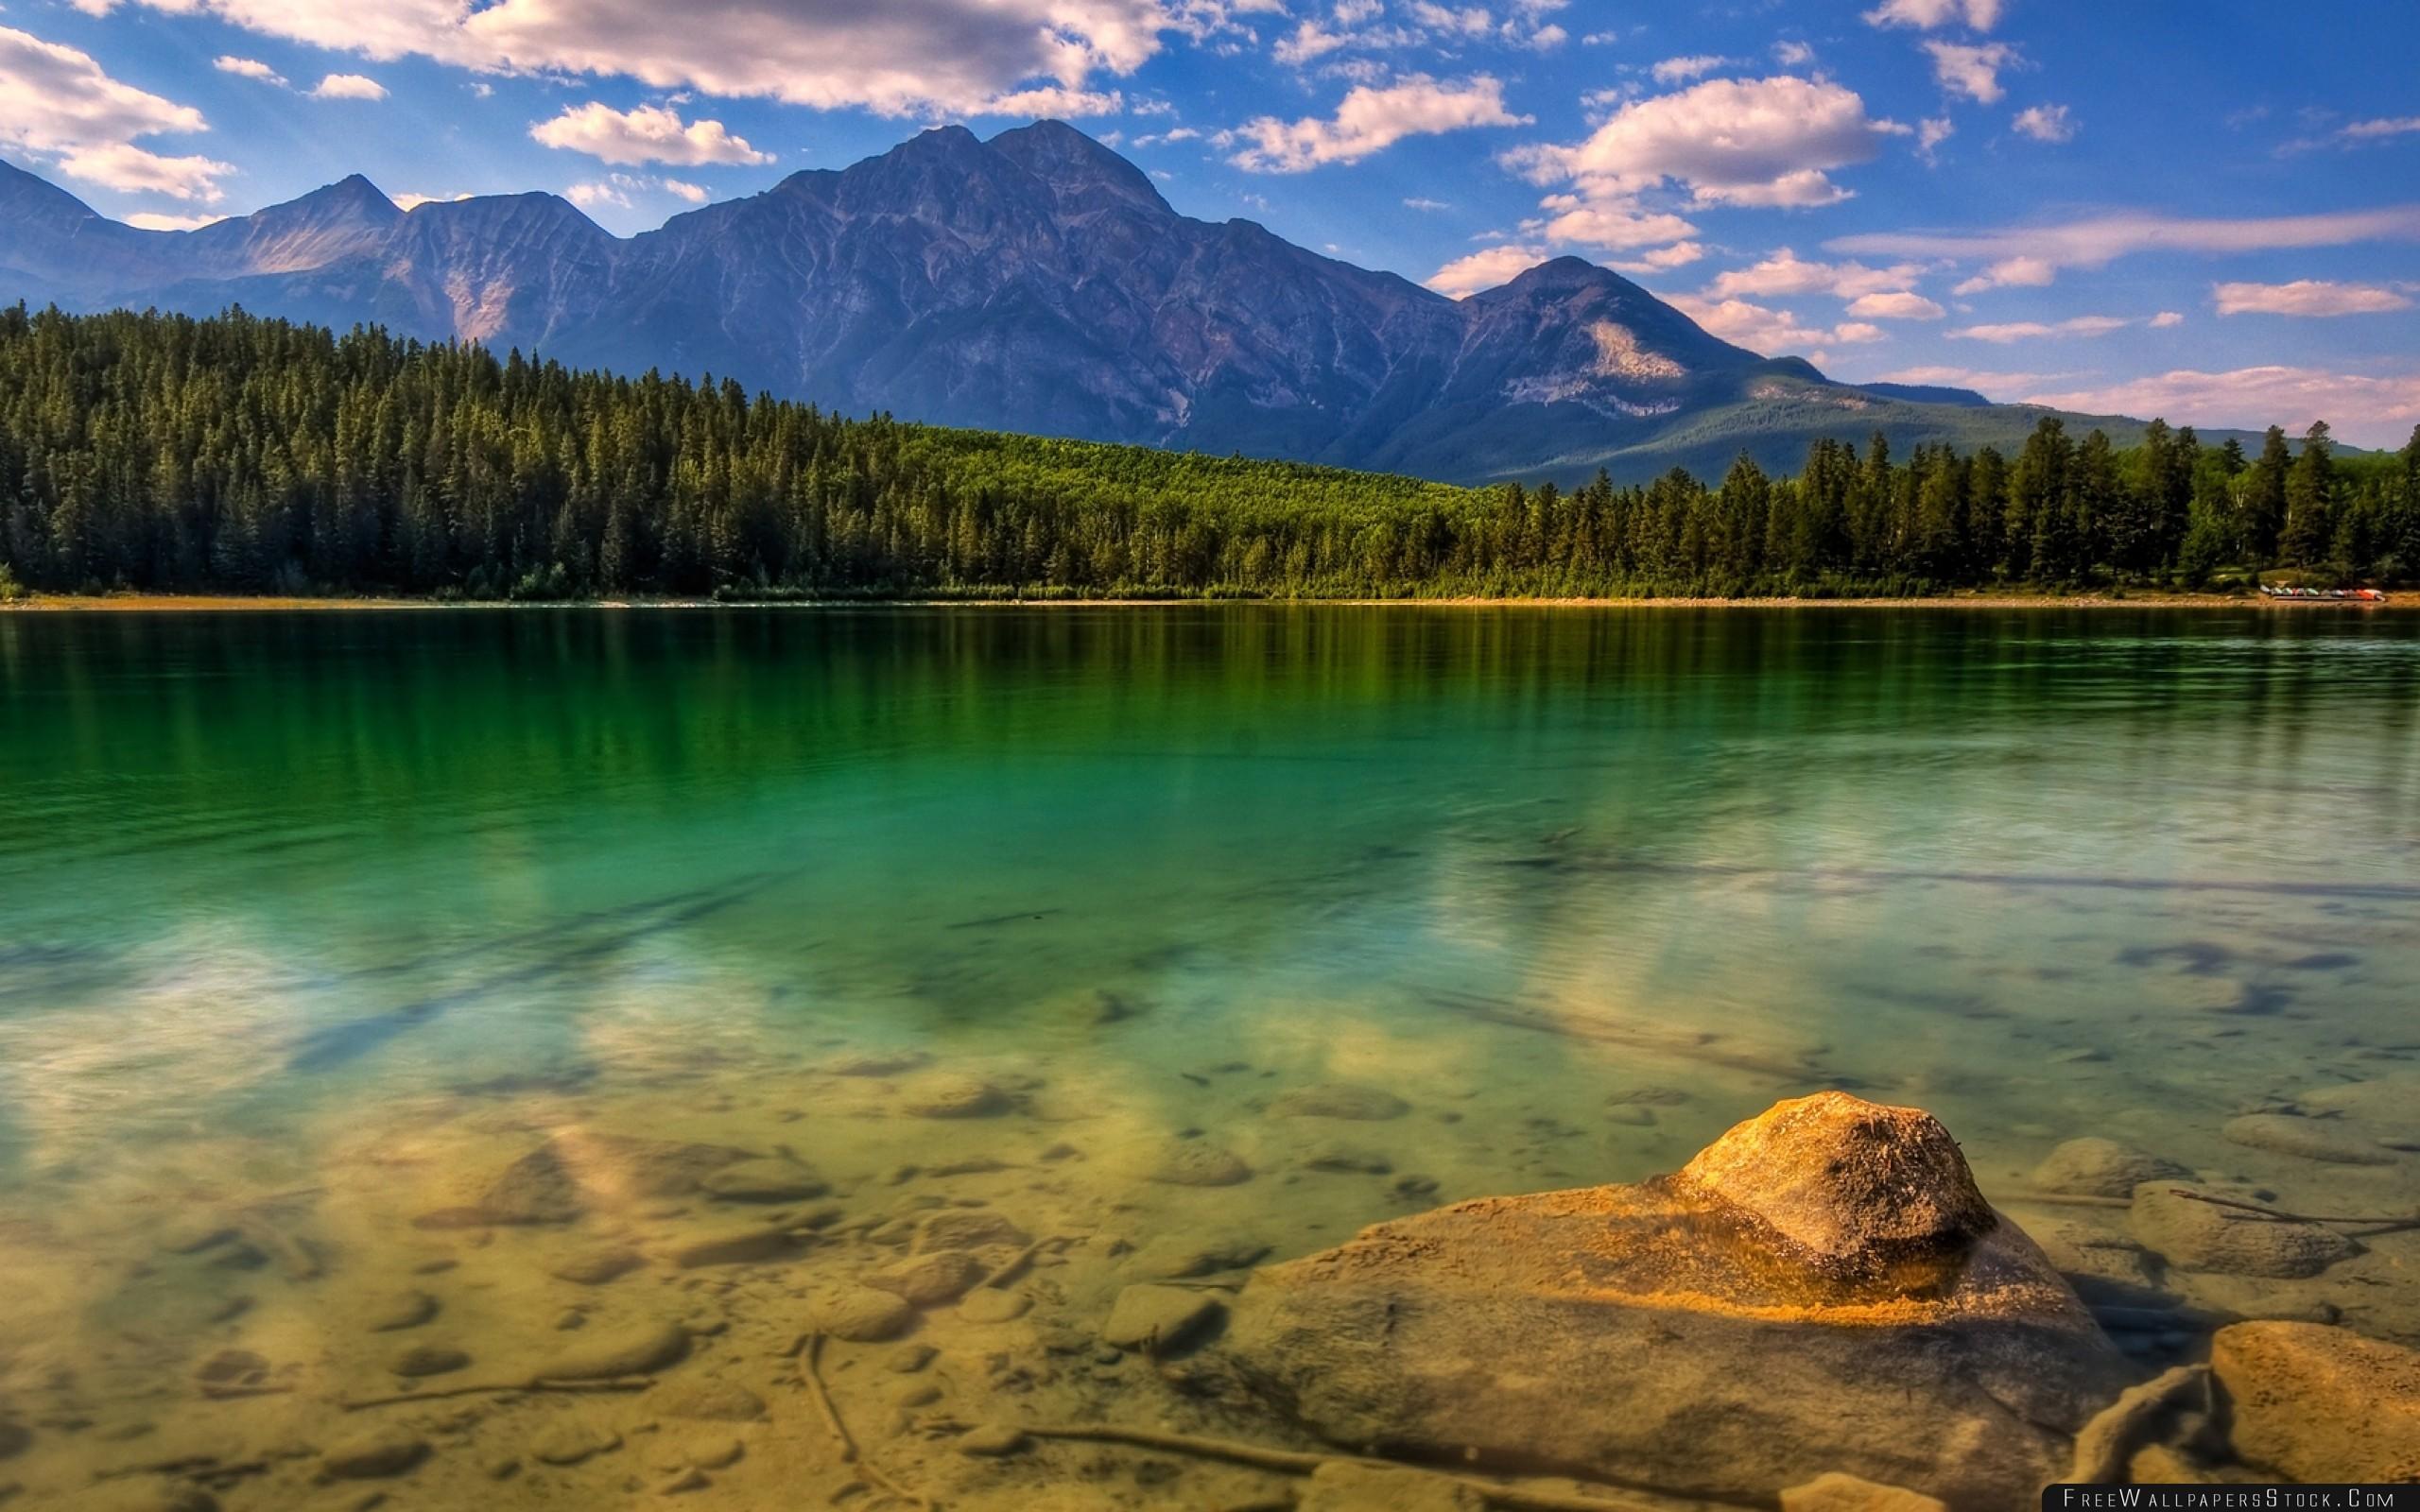 Download Free Wallpaper Wood Trees Coast Lake Bottom Water Transparent Stones Mountains